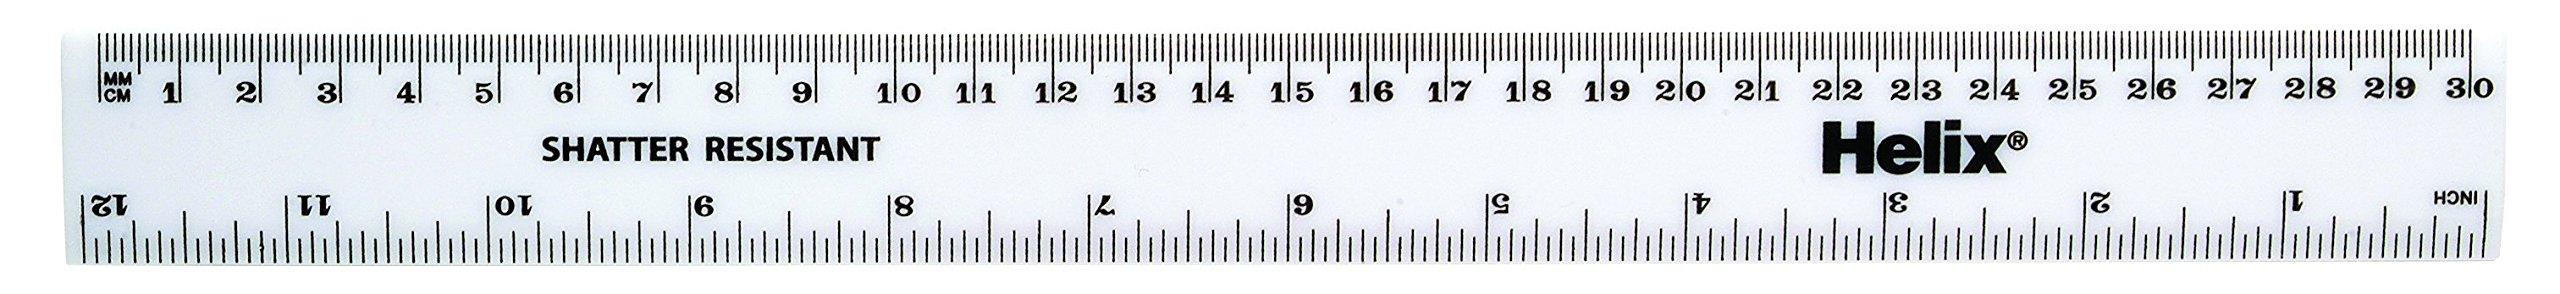 Helix 30cm 300 mm Metric Ruler White (Box of 100)